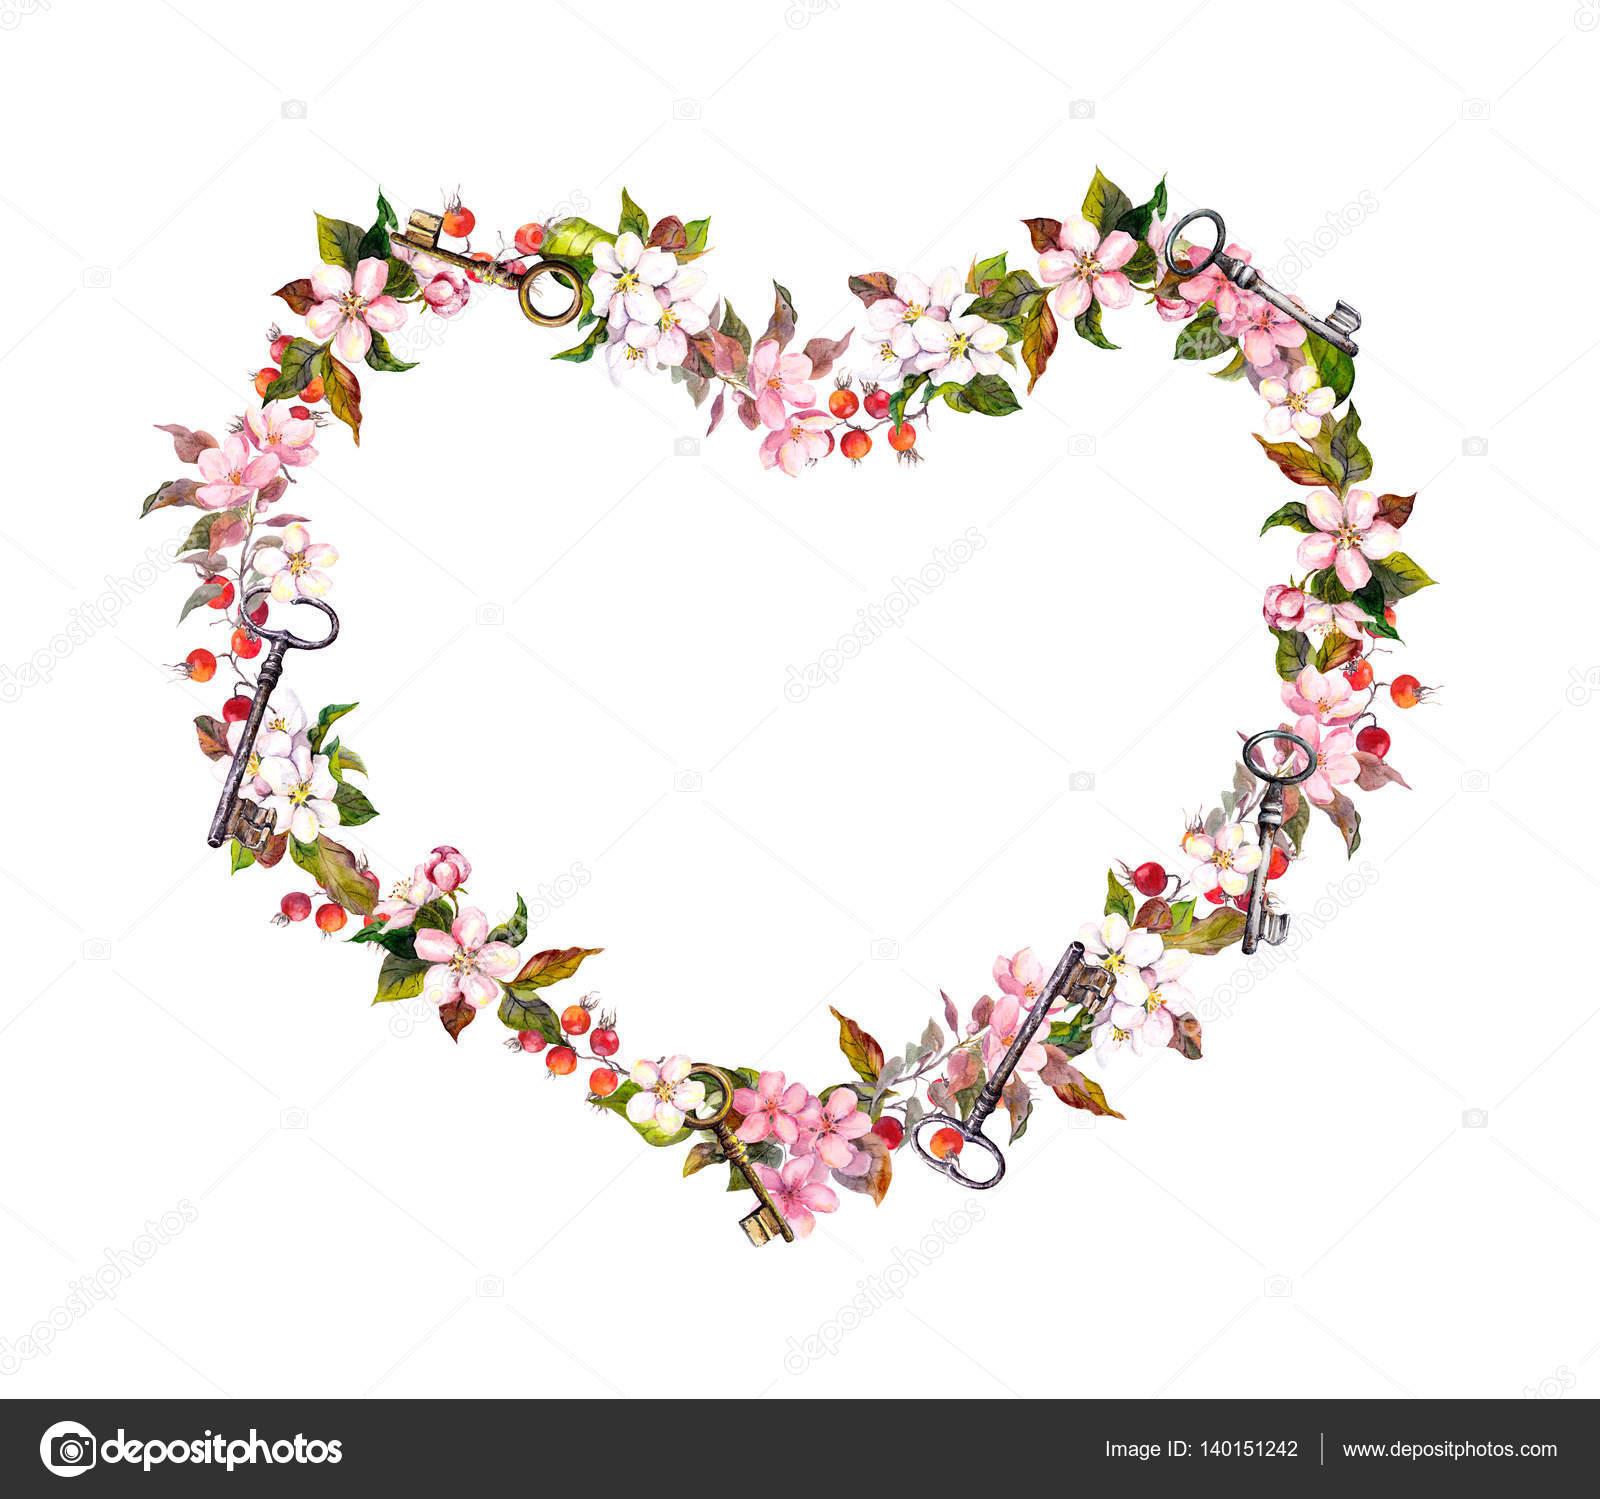 Floral wreath heart shape pink flowers hearts keys watercolor pink flowers hearts and keys watercolor for valentine day wedding photo by zzzorikk mightylinksfo